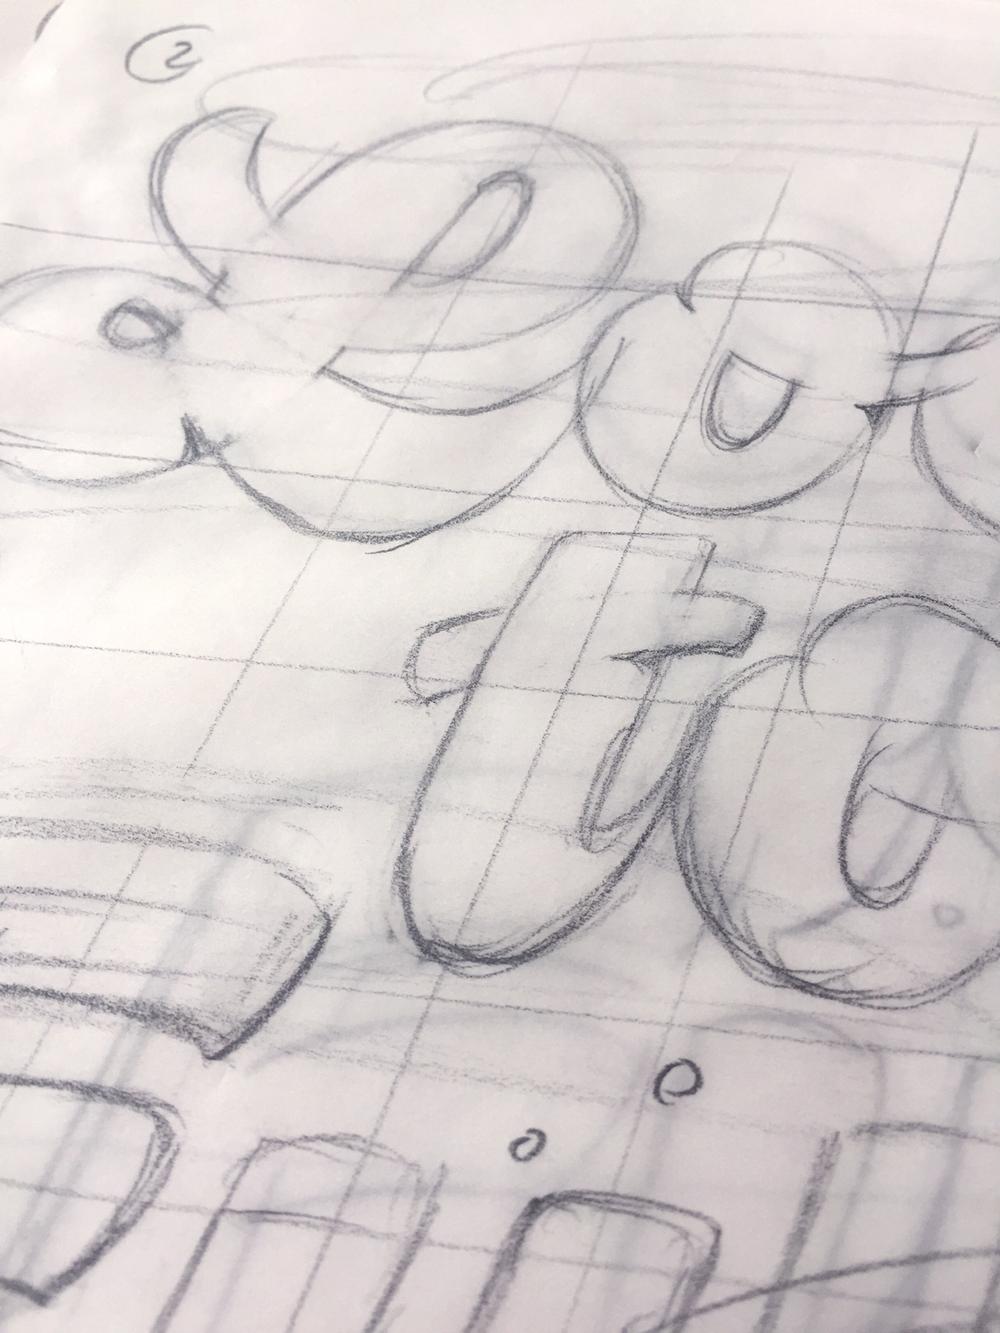 Sketch-4.png